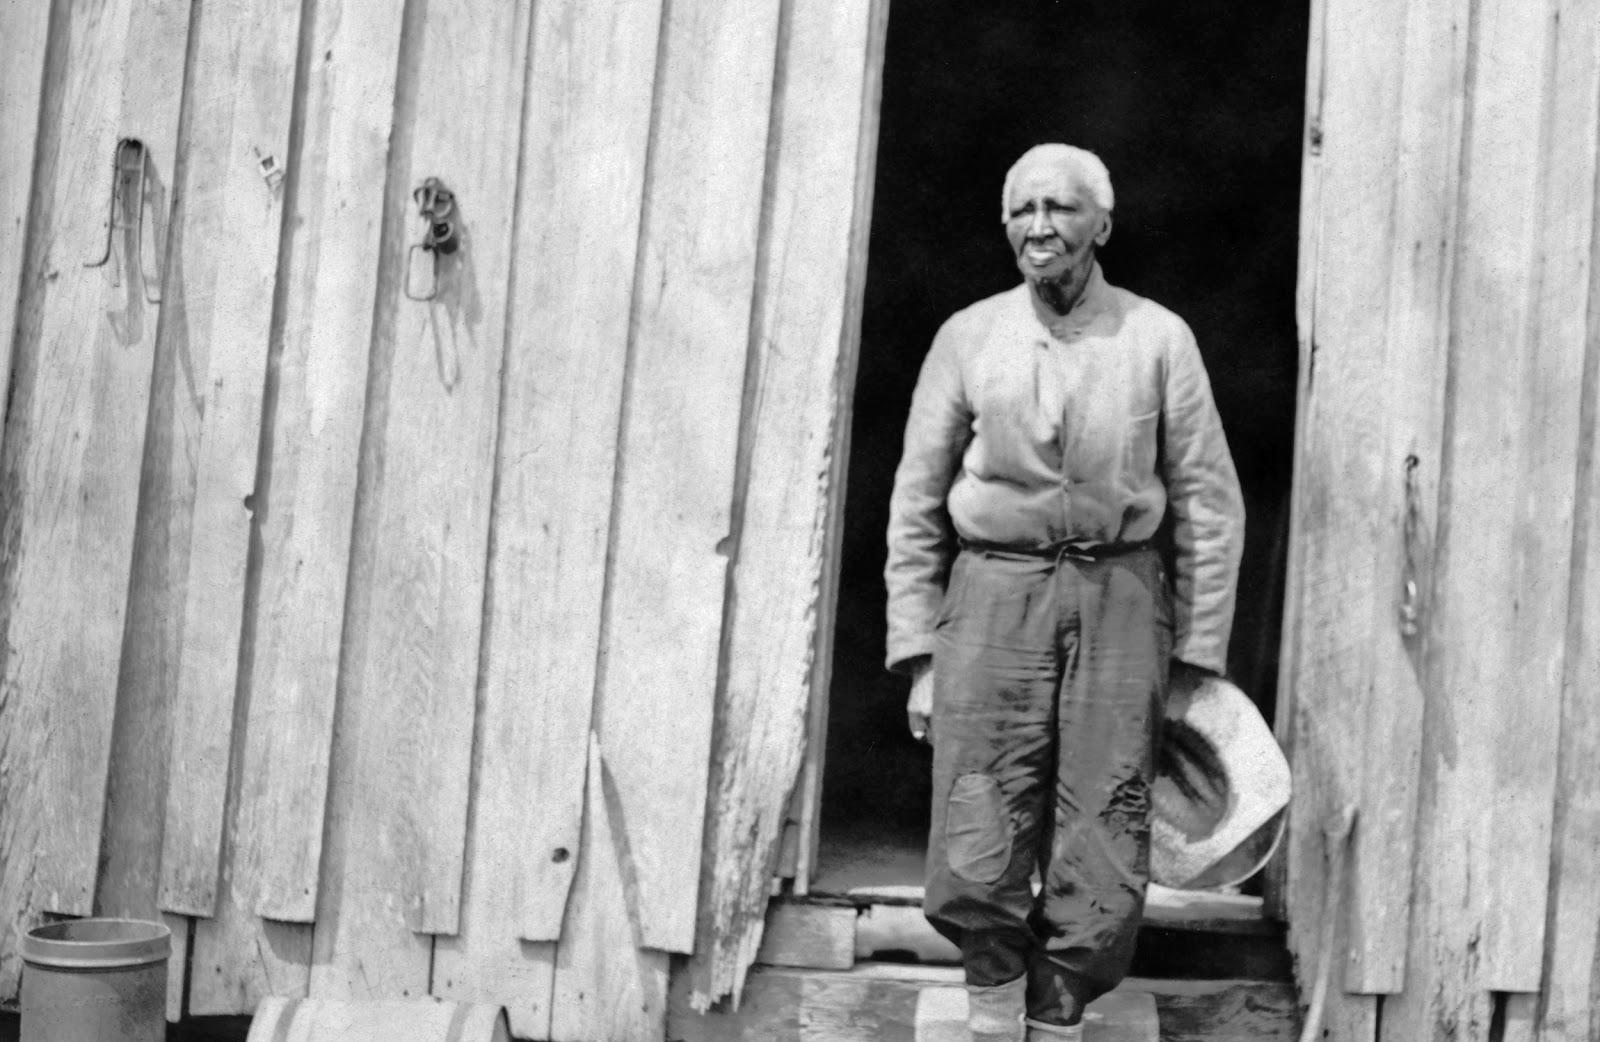 haunting in american slave narratives essay Free slave narratives papers, essays, and research papers essay-writenet.